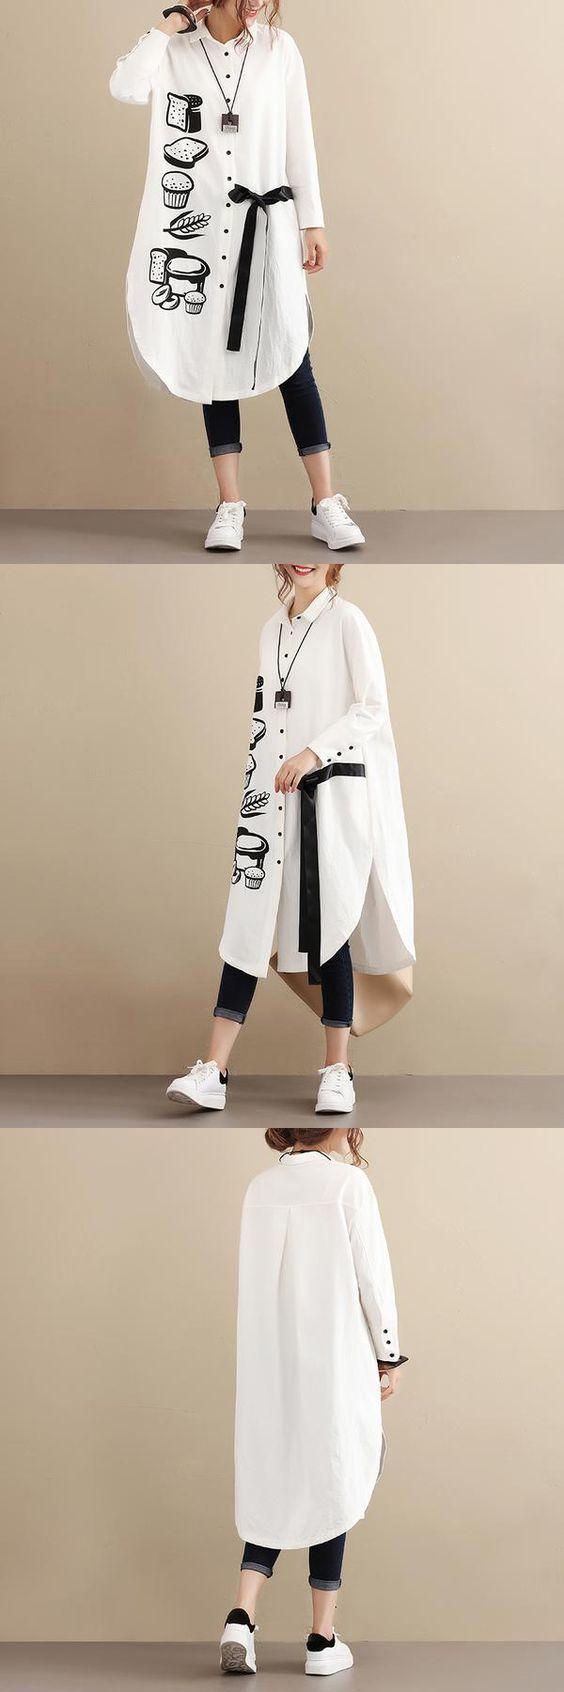 1116 Best Giyim Images On Pinterest Tunics Classy Outfits And Jackets Tendencies Short Shirt Grey Stripe Pocket Abu Muda L Tunik